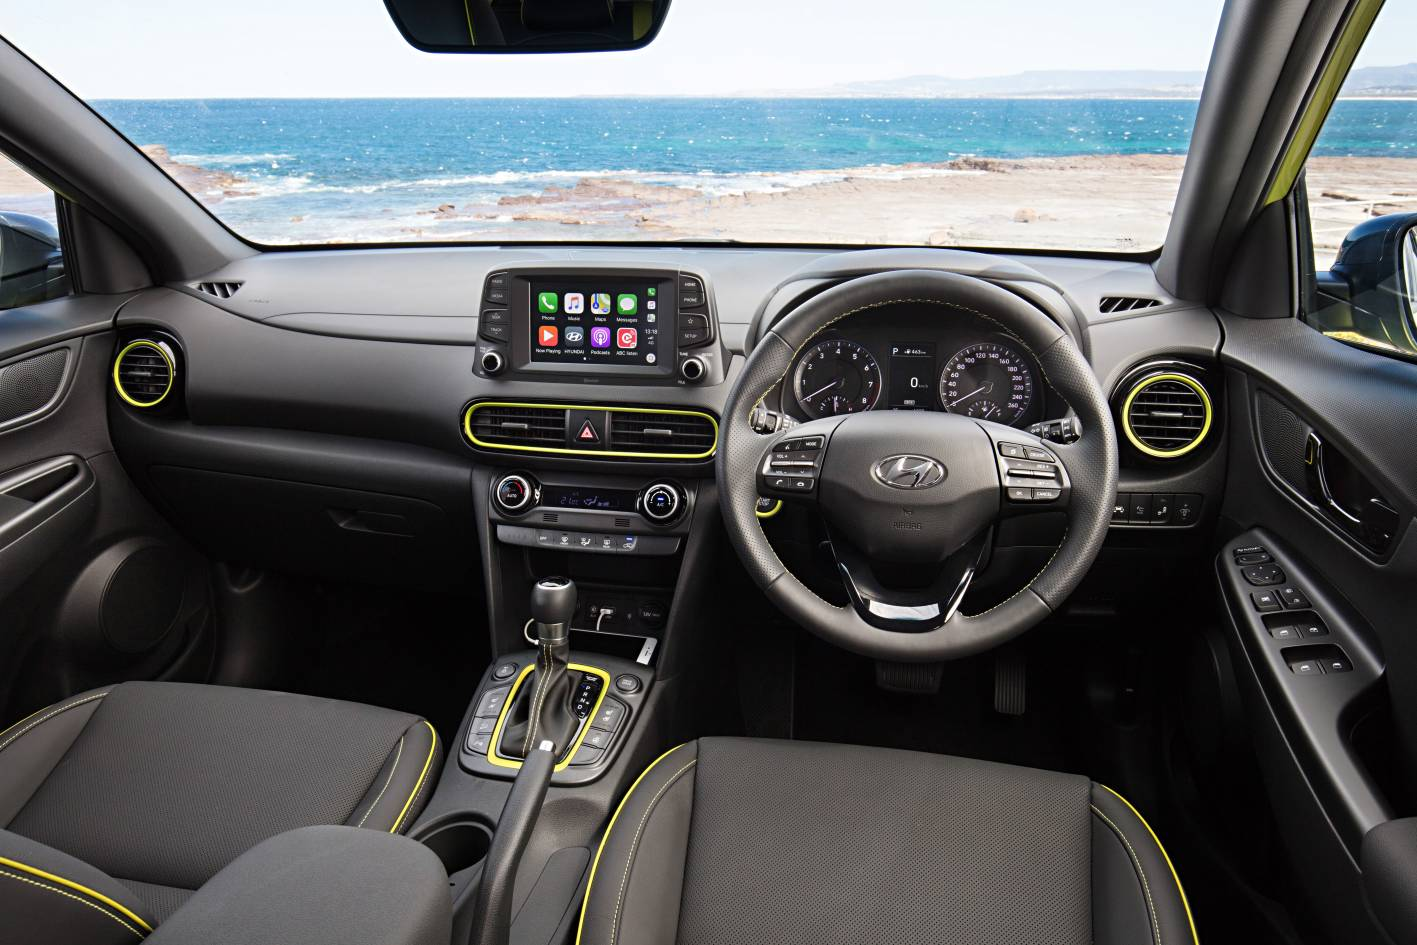 Veloster For Sale >> Hyundai Kona on sale in Australia from $24,500